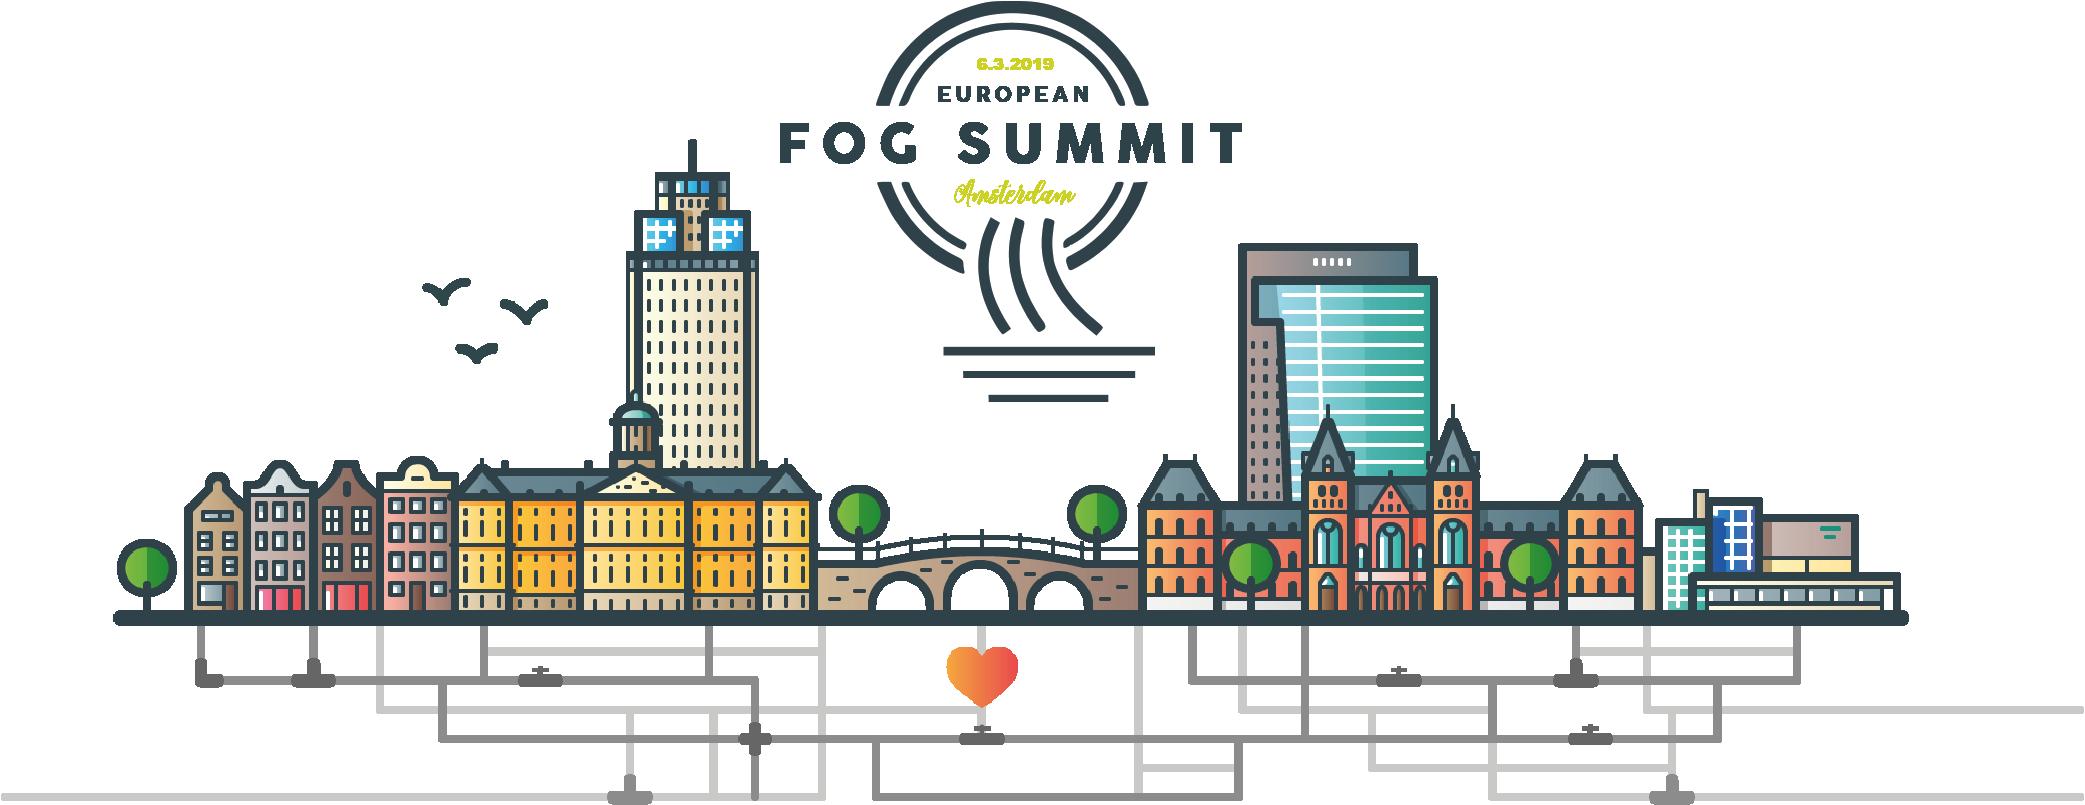 European FOG Summit 2019